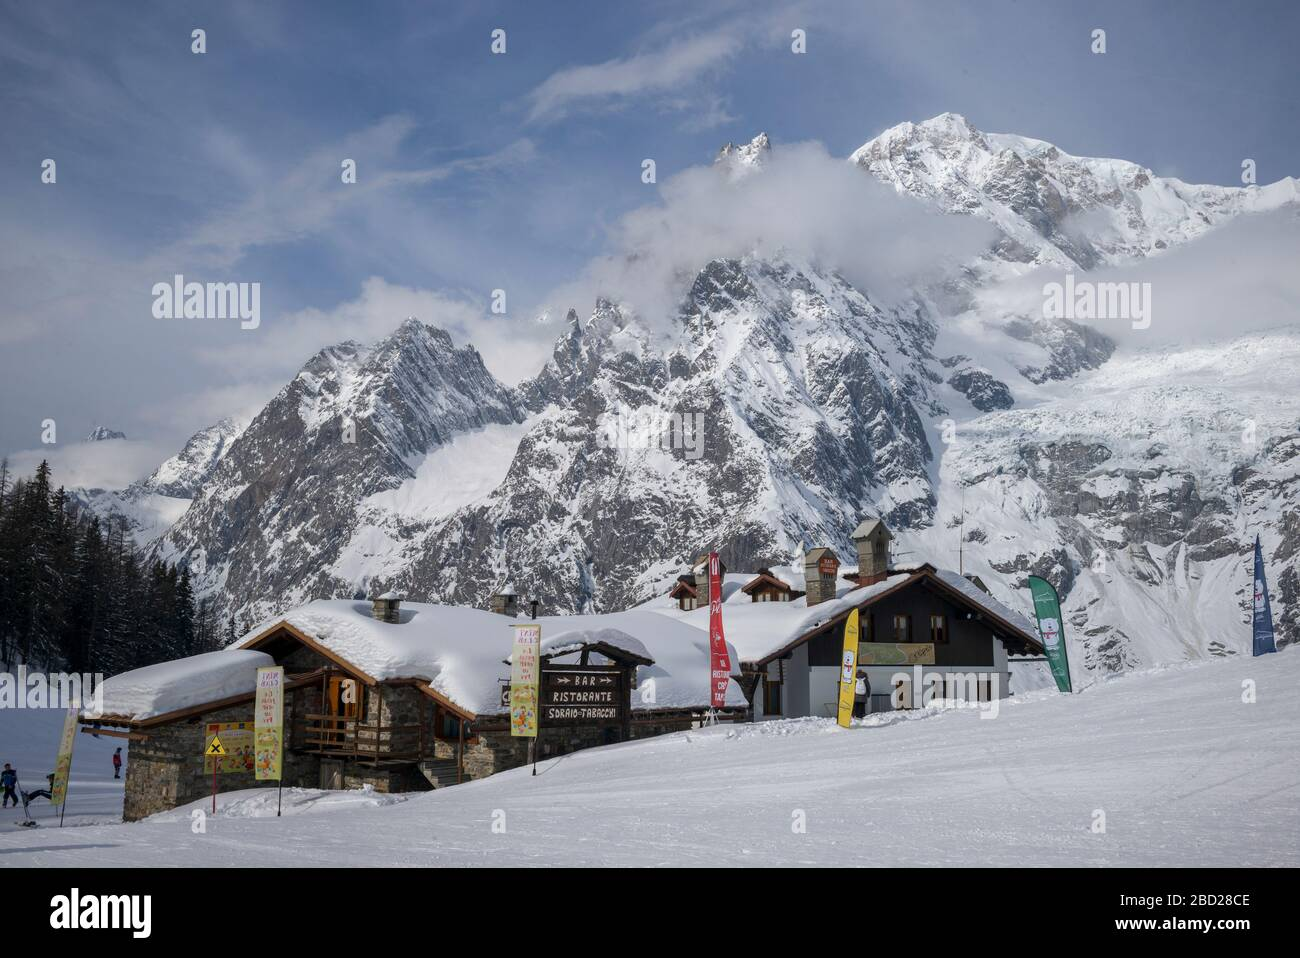 Snowcapped mountain range, Alpine Resort, Aosta Valley, Courmayeur, Northern Italy, Italy Stock Photo